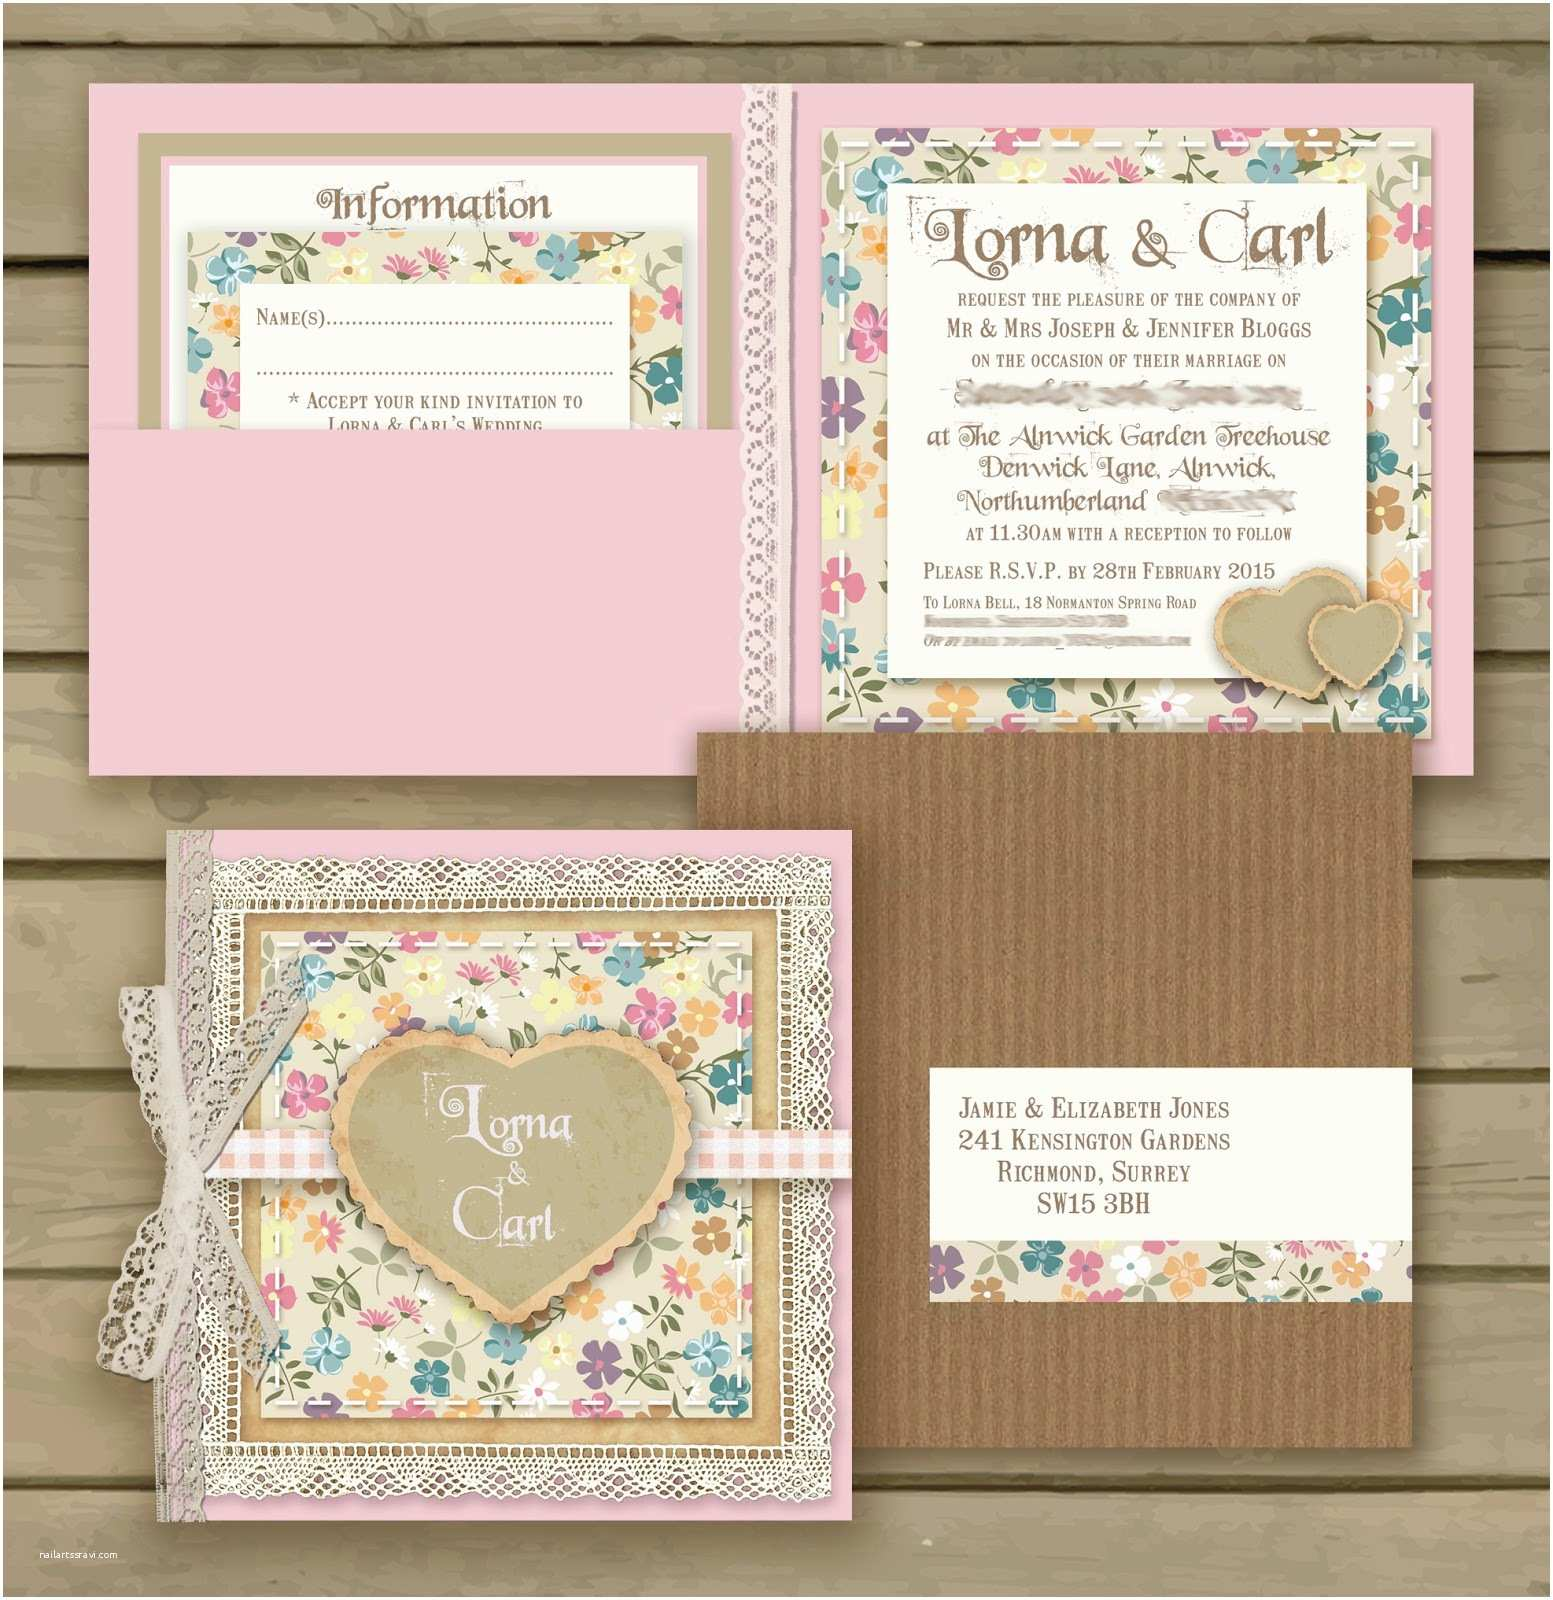 Lace Wedding Invitations Vistaprint Knots and Kisses Wedding Stationery December 2014